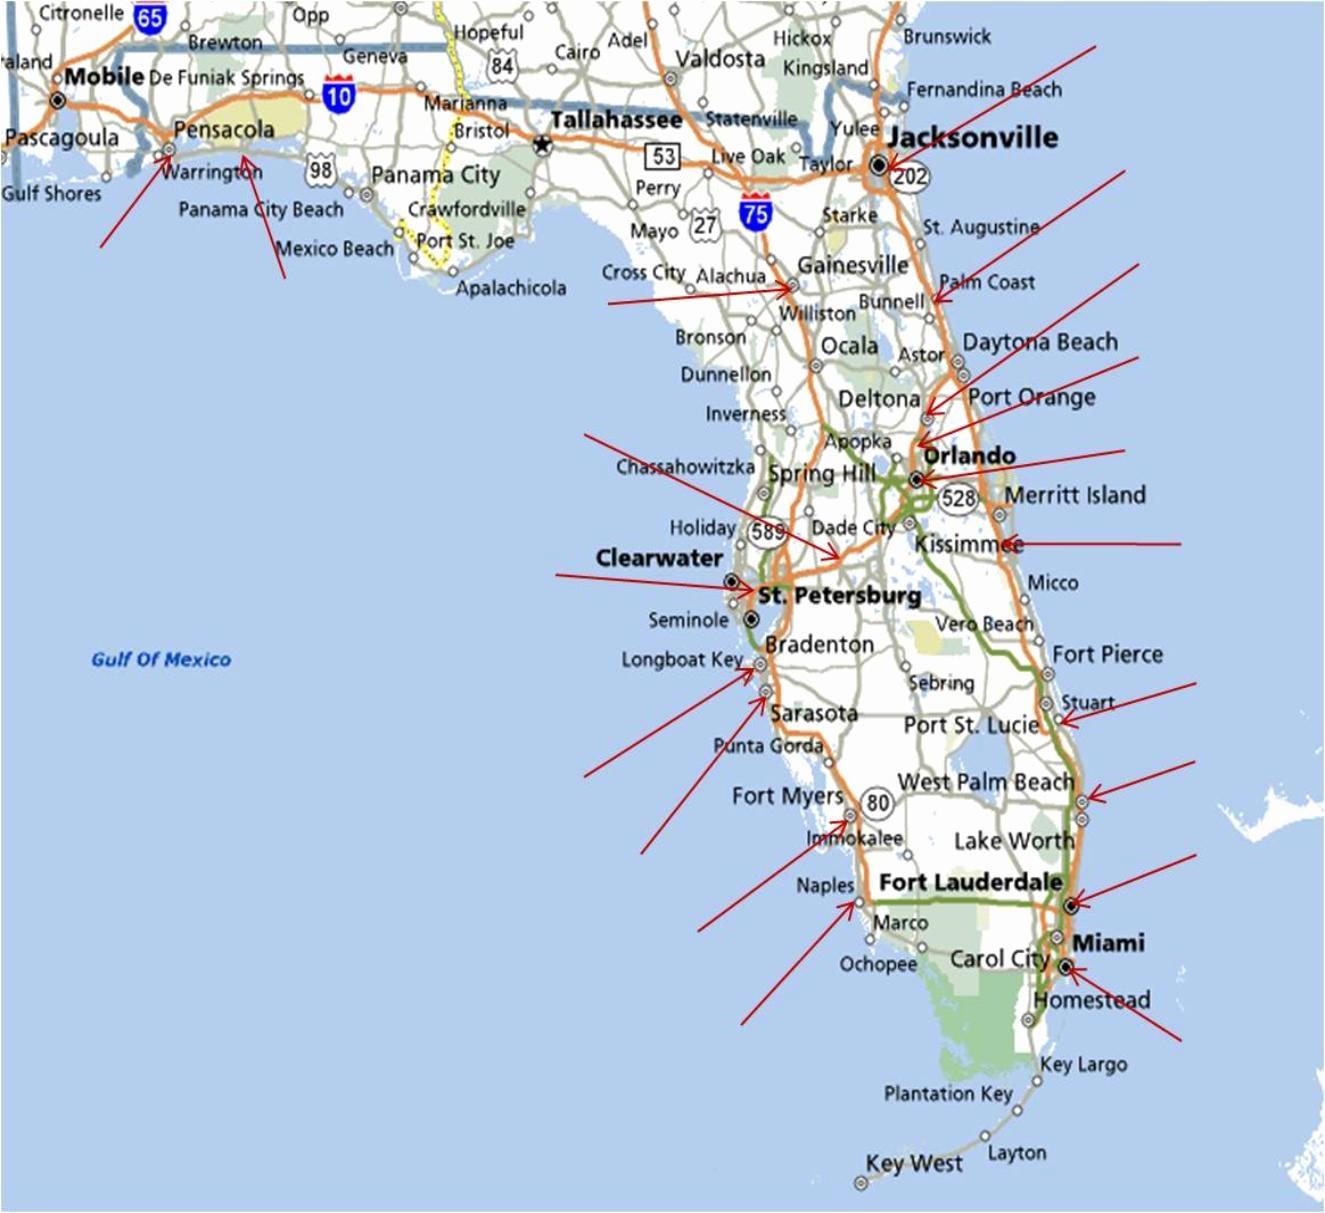 Best East Coast Florida Beaches New Map Florida West Coast Florida - Map Of East Coast Of Florida Cities